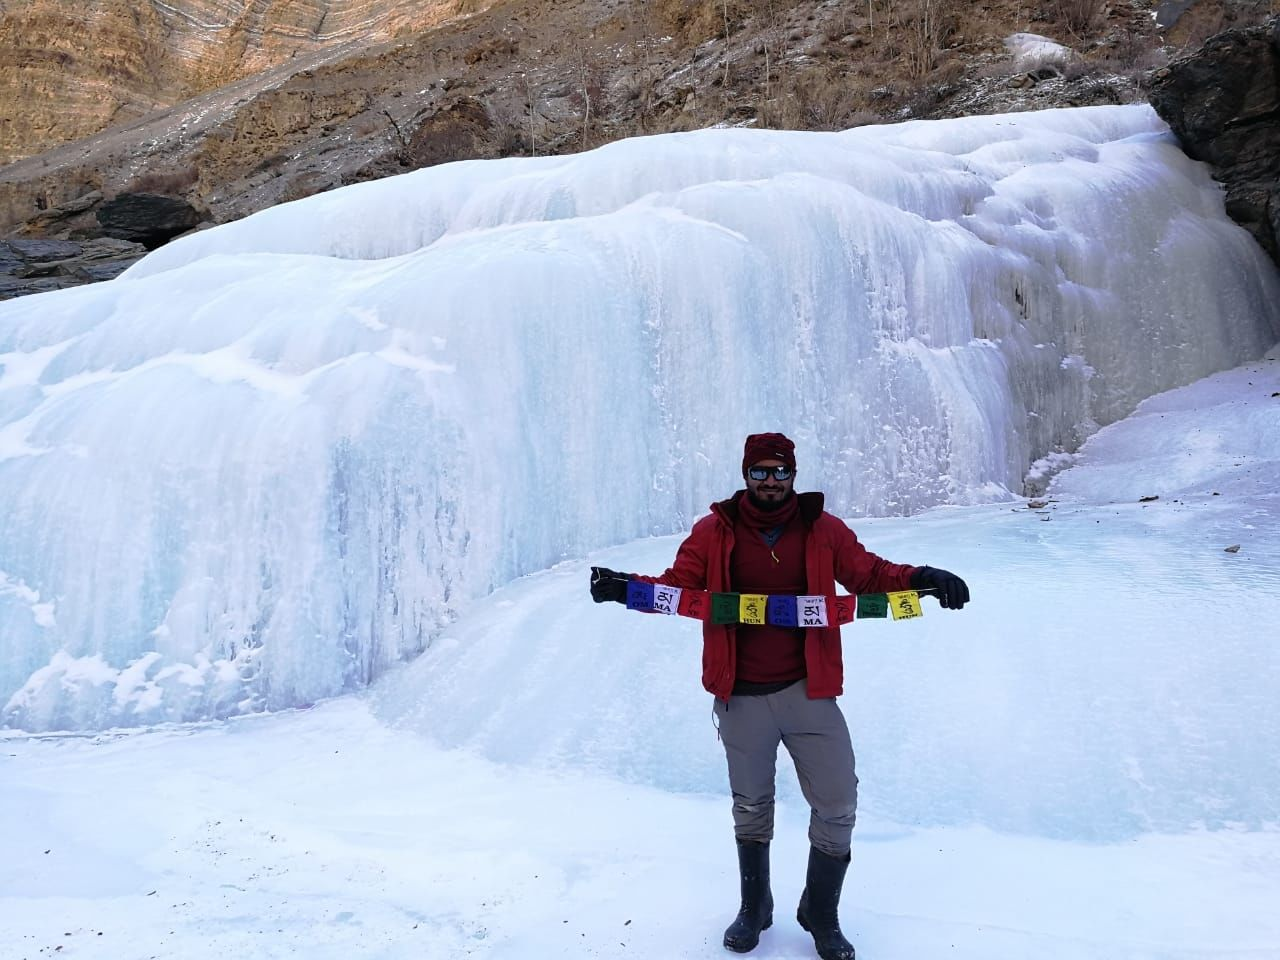 Photo of Chadar trek - Trekking In Ladakh - Frozen River Trekking In Ladakh By Ajay Singh